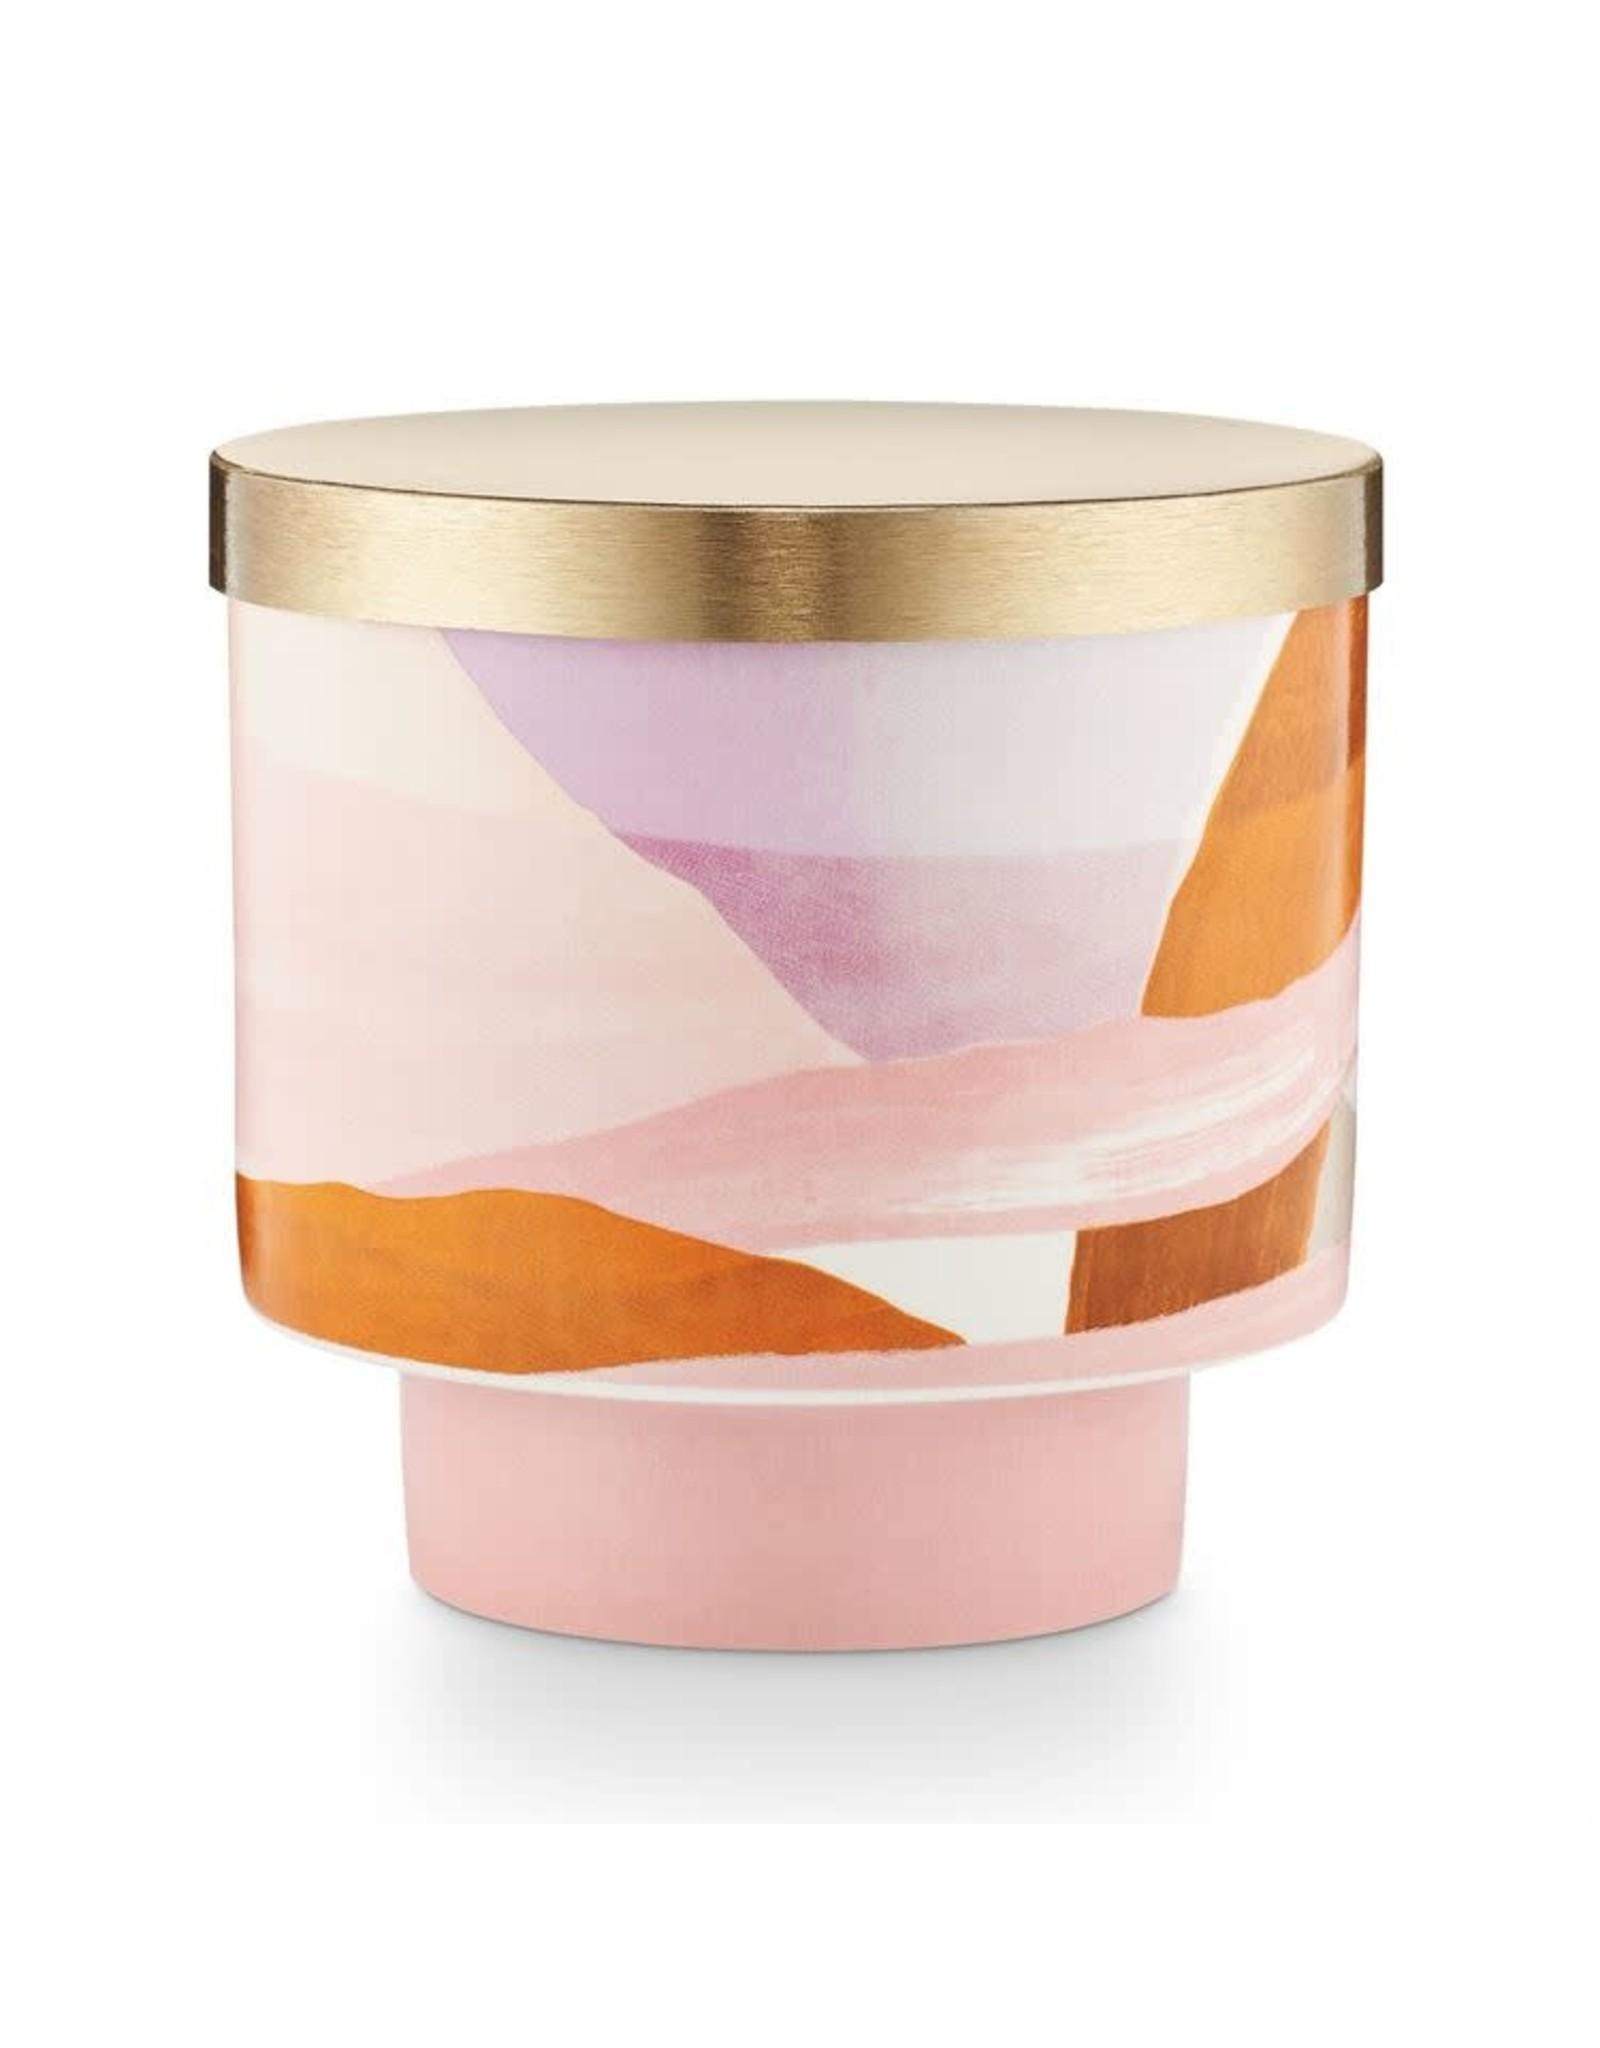 Illume Coconut Milk Lidded Ceramic Candle